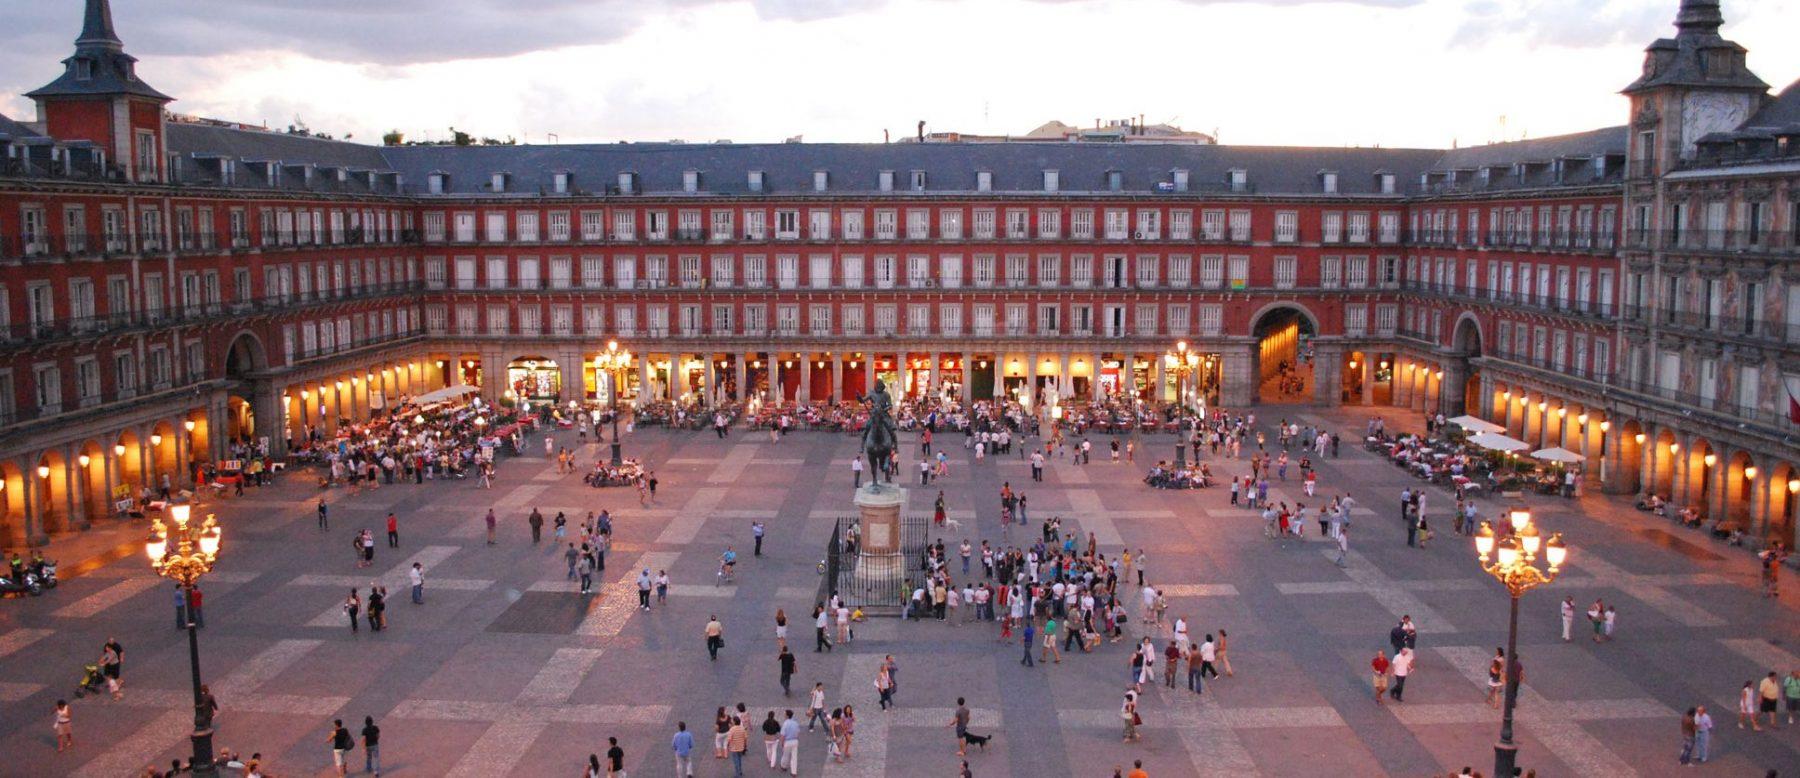 Plaza_Mayor_de_Madrid-e1519728258293